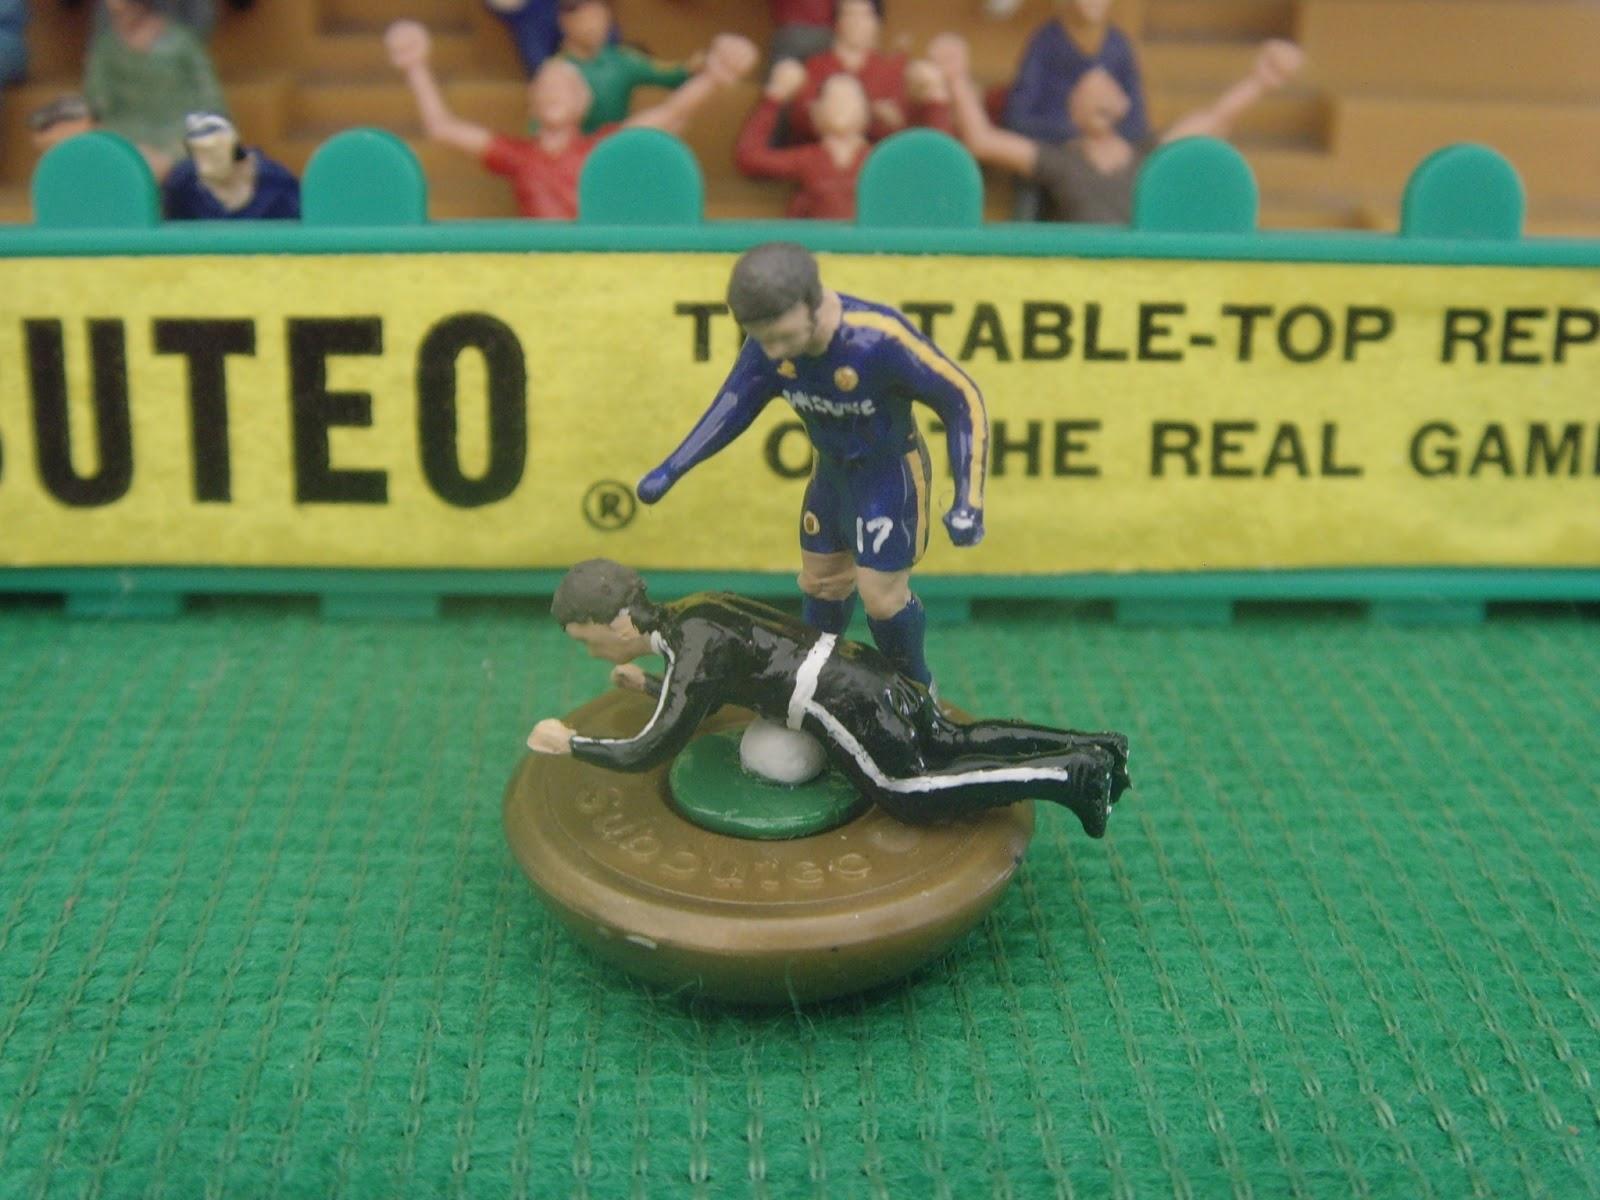 Eden Hazard's ballboy incident given Subbuteo treatment